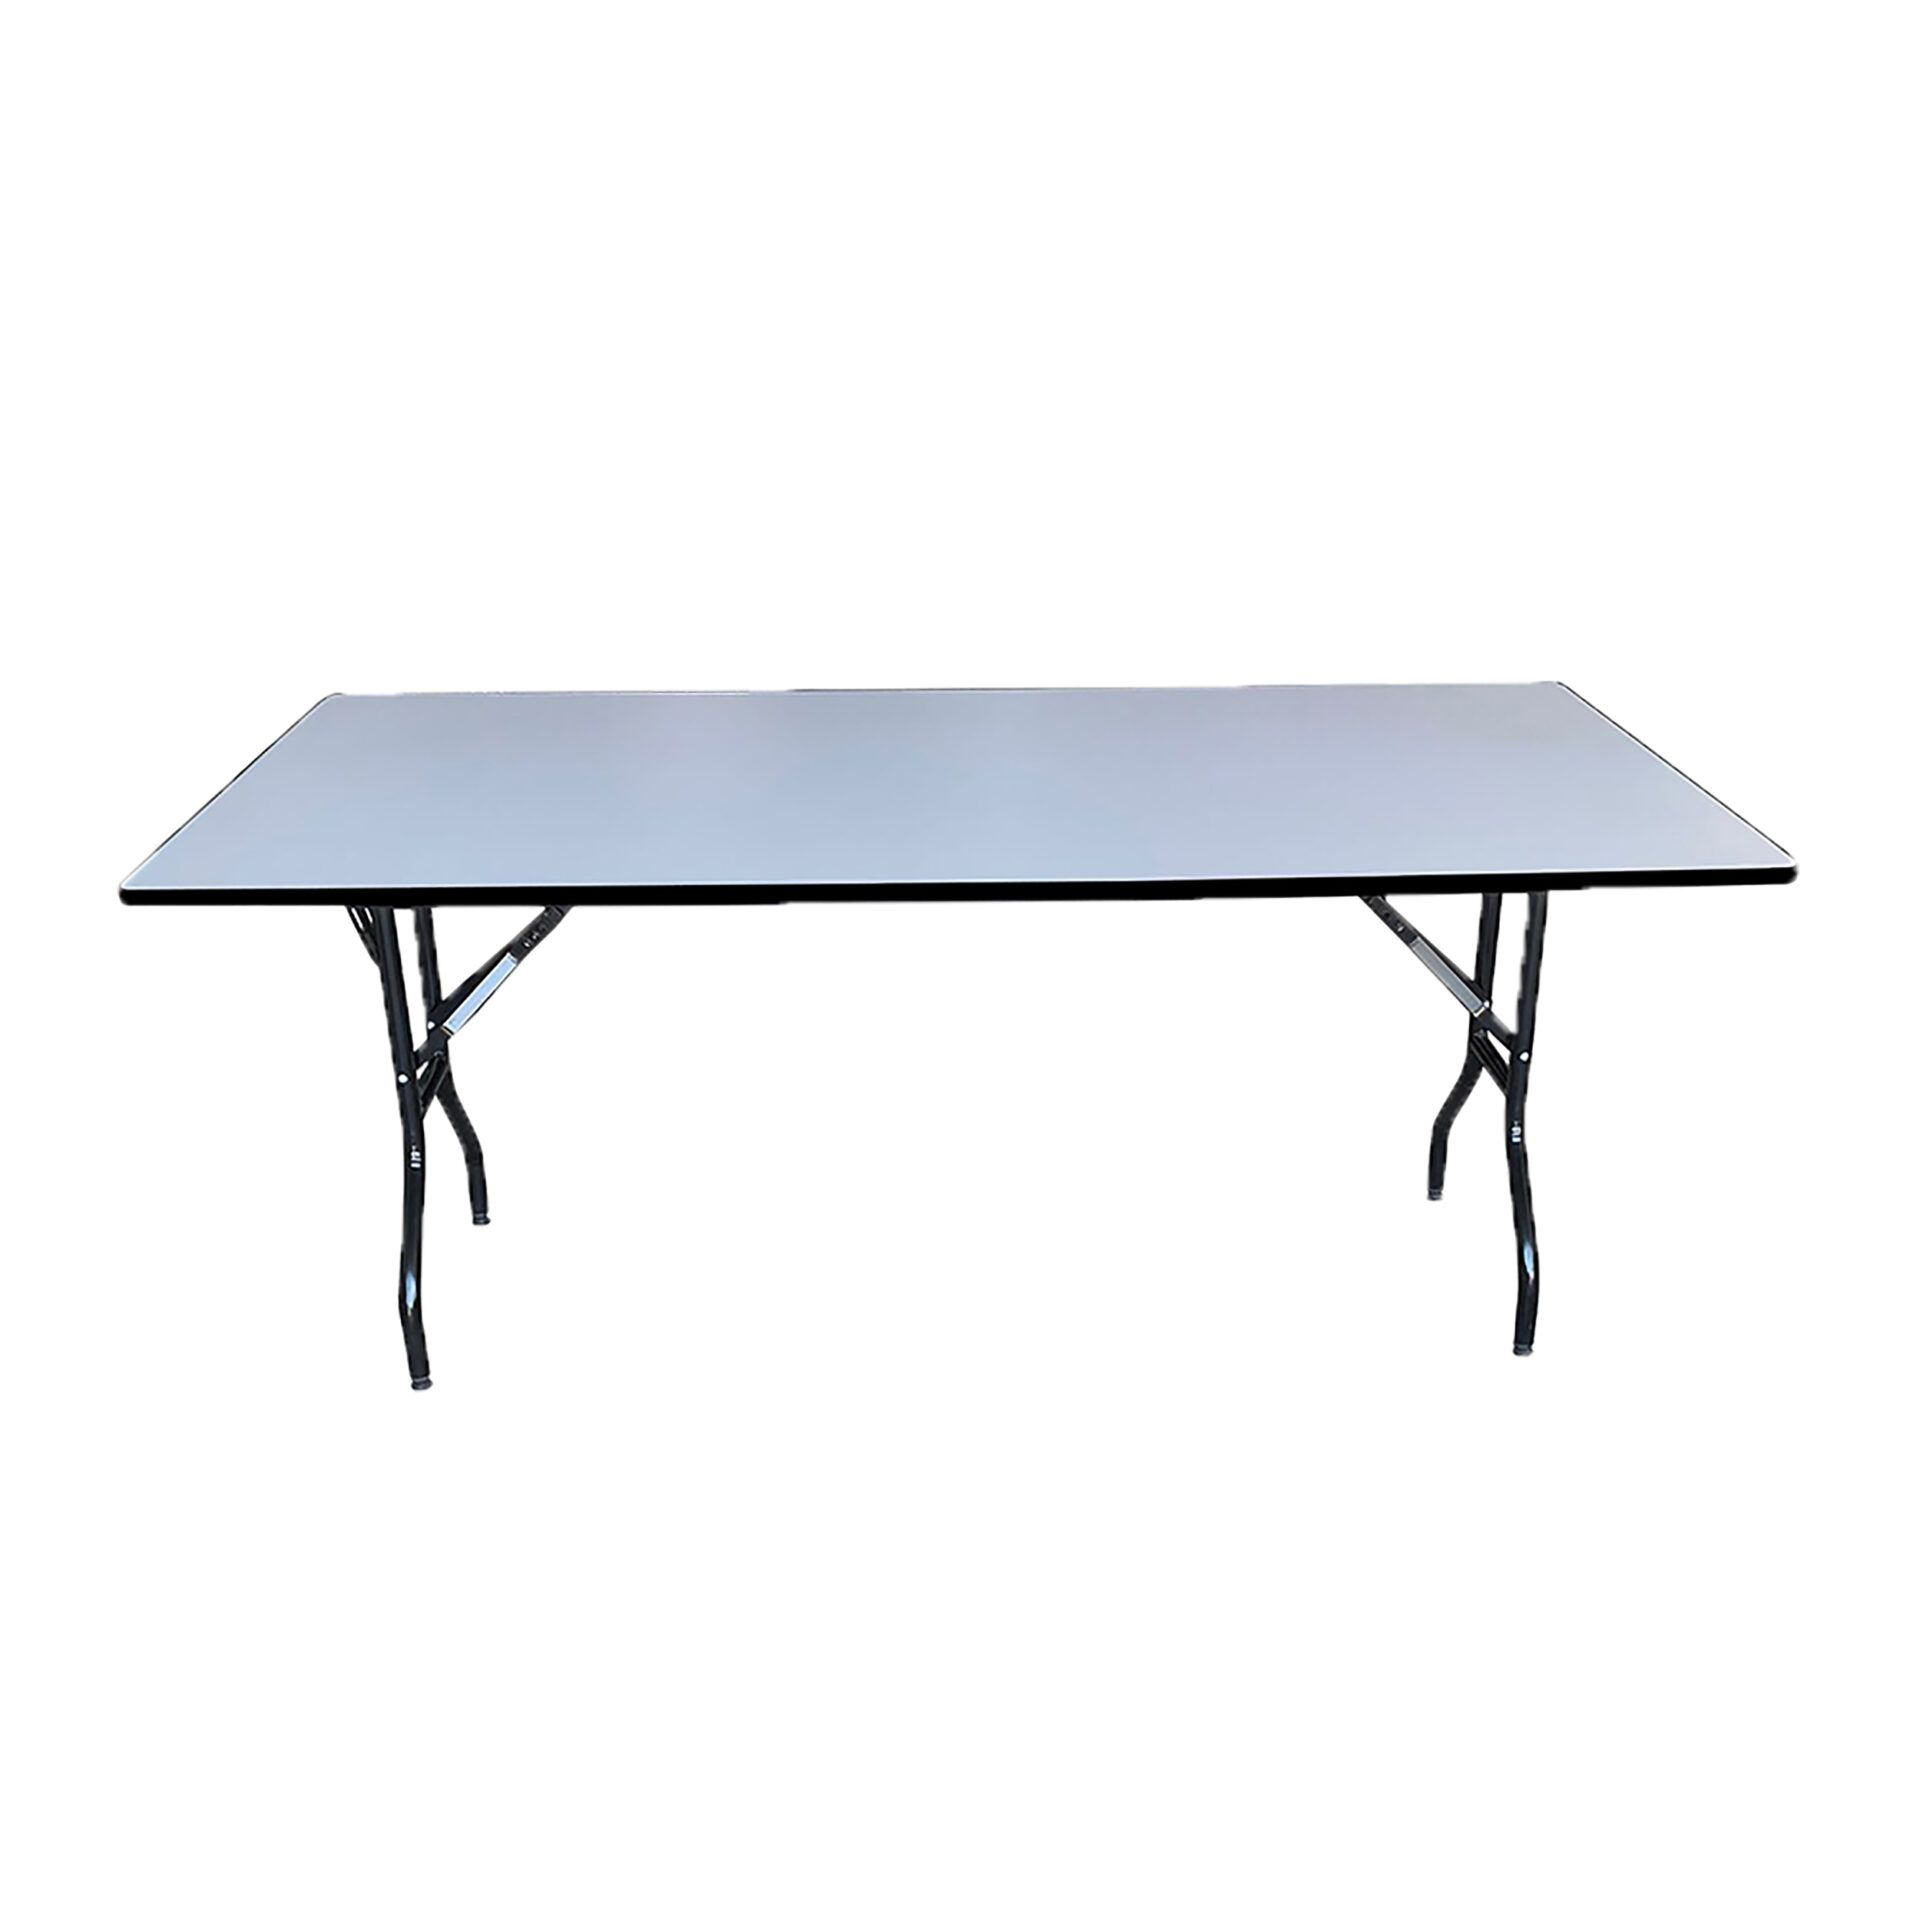 180x90cm rectangular Table White 2500x2500 1